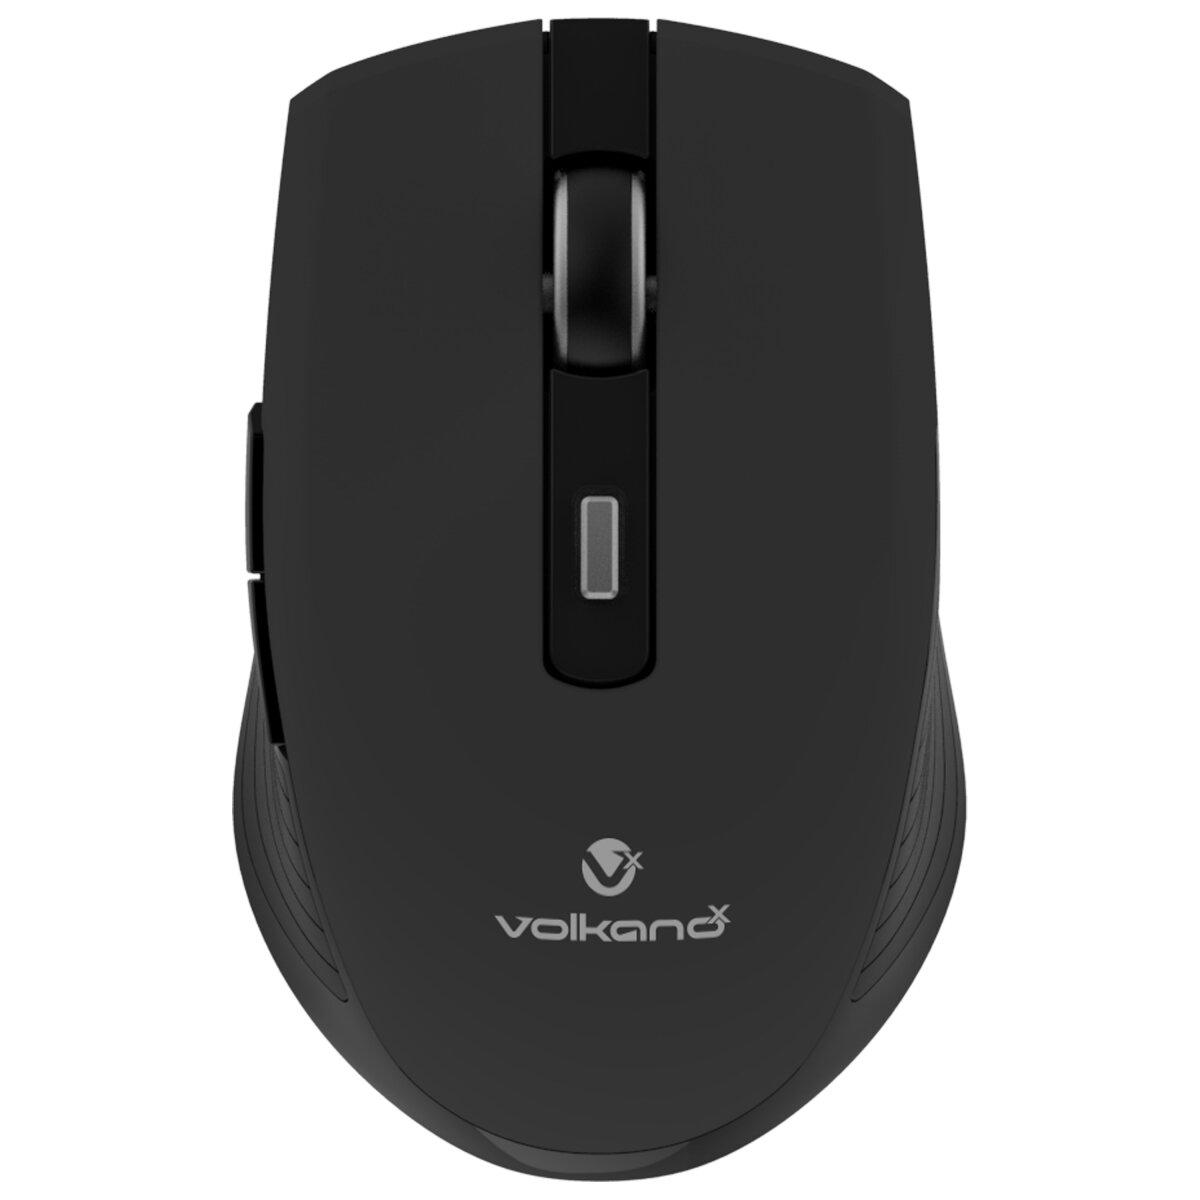 VolkanoX Uranium series 6 button Wireless Mouse